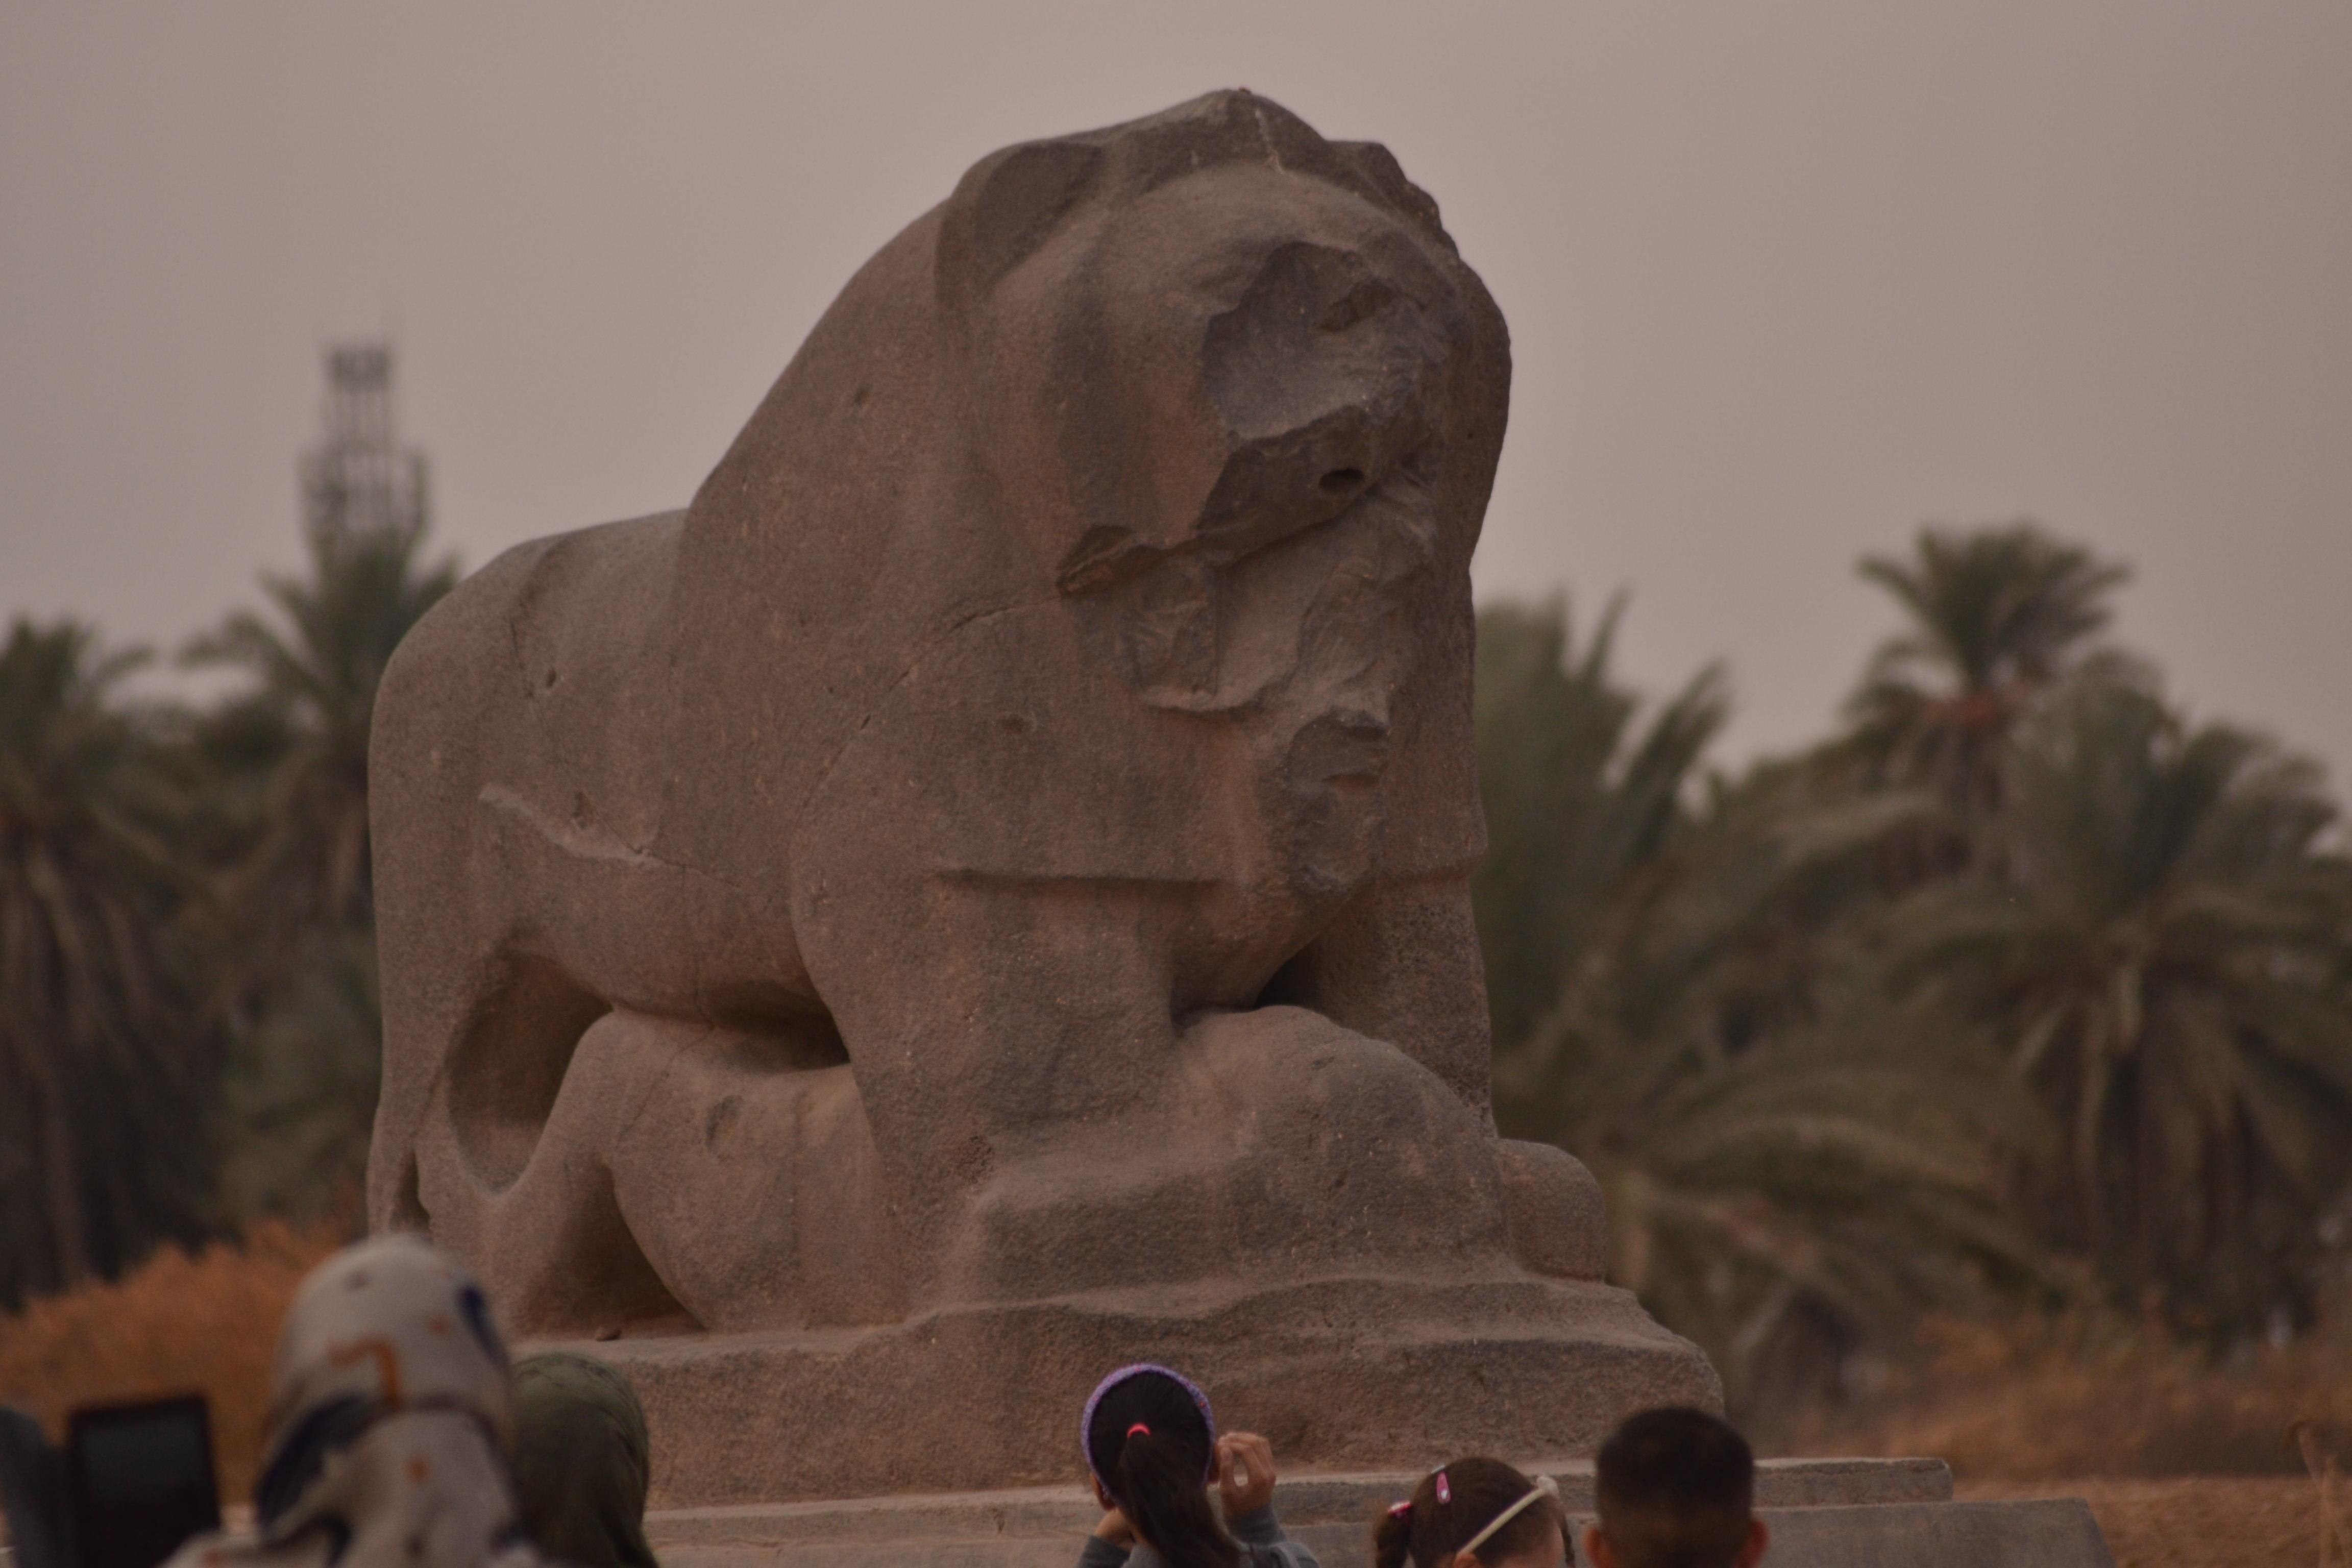 15c2c593a أسد بابل (تمثال) - ويكيبيديا، الموسوعة الحرة